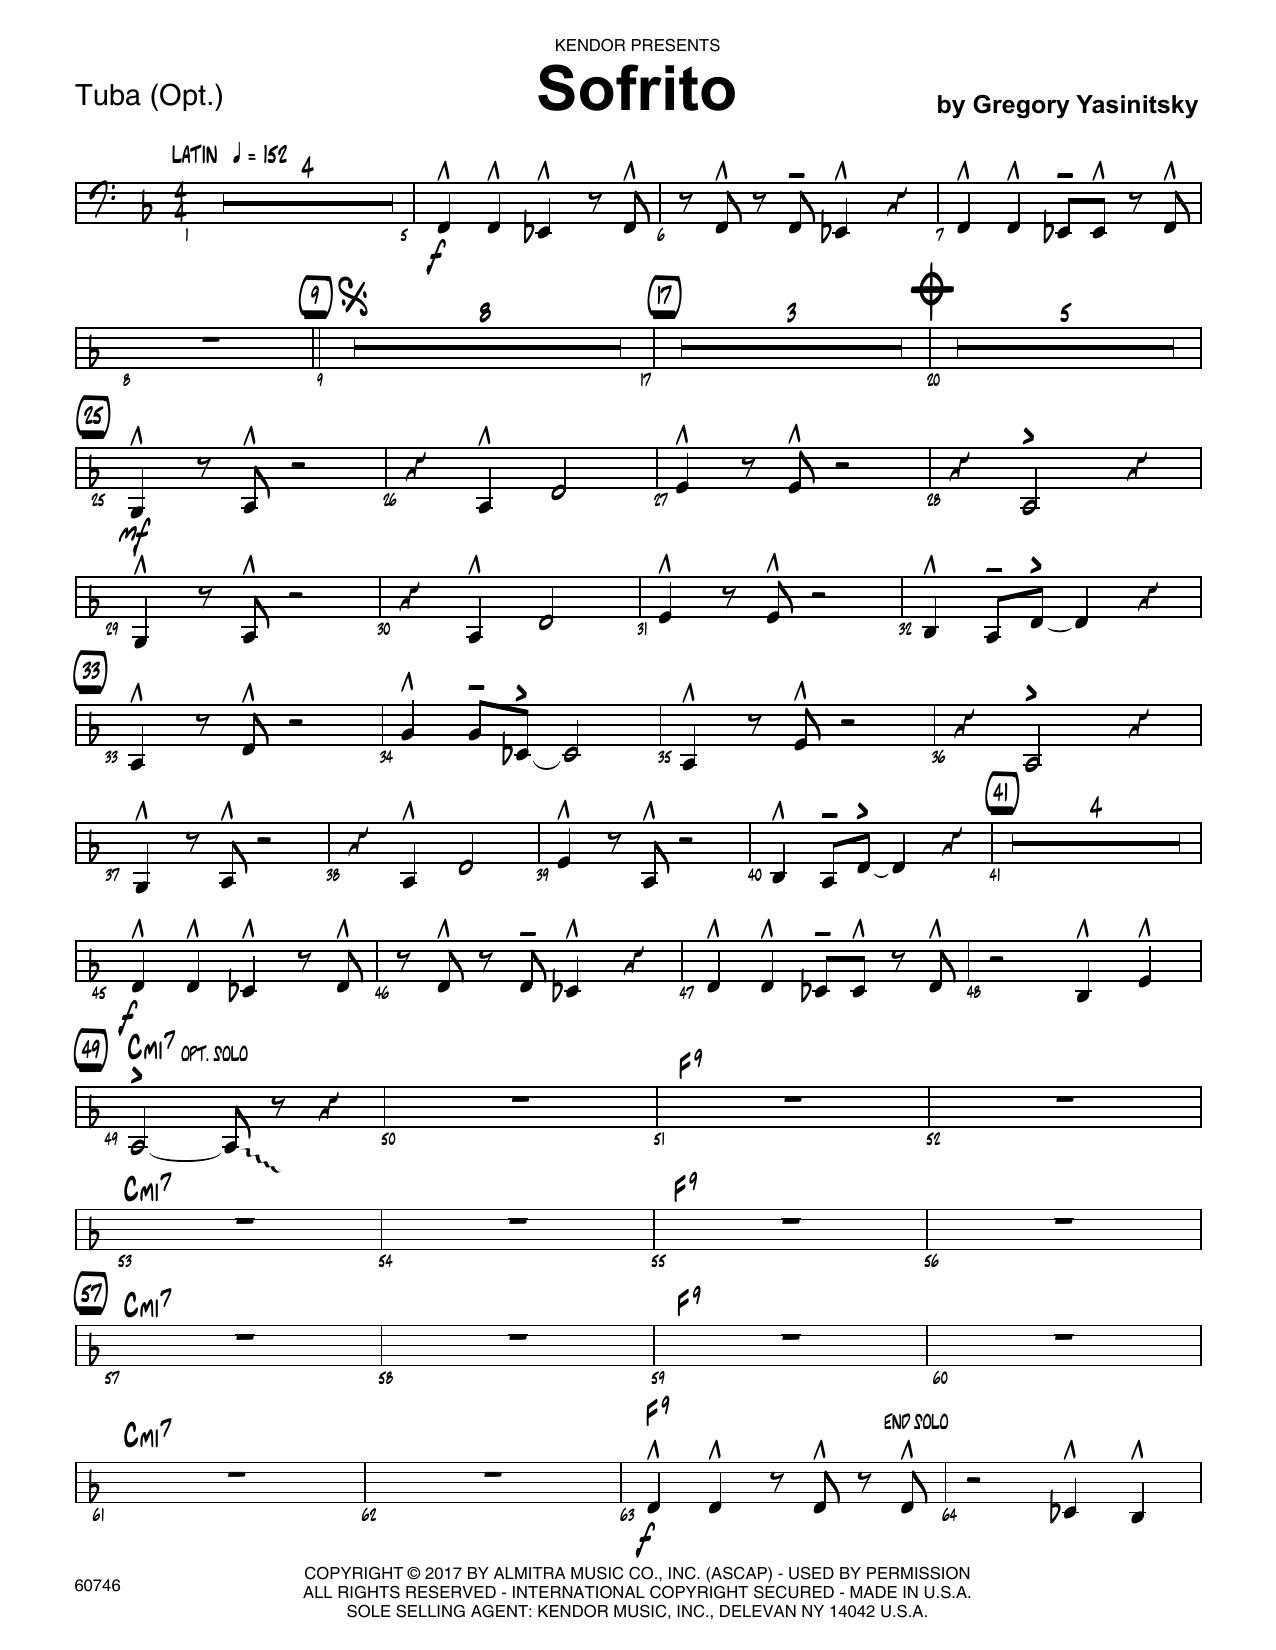 Sofrito - Tuba Sheet Music